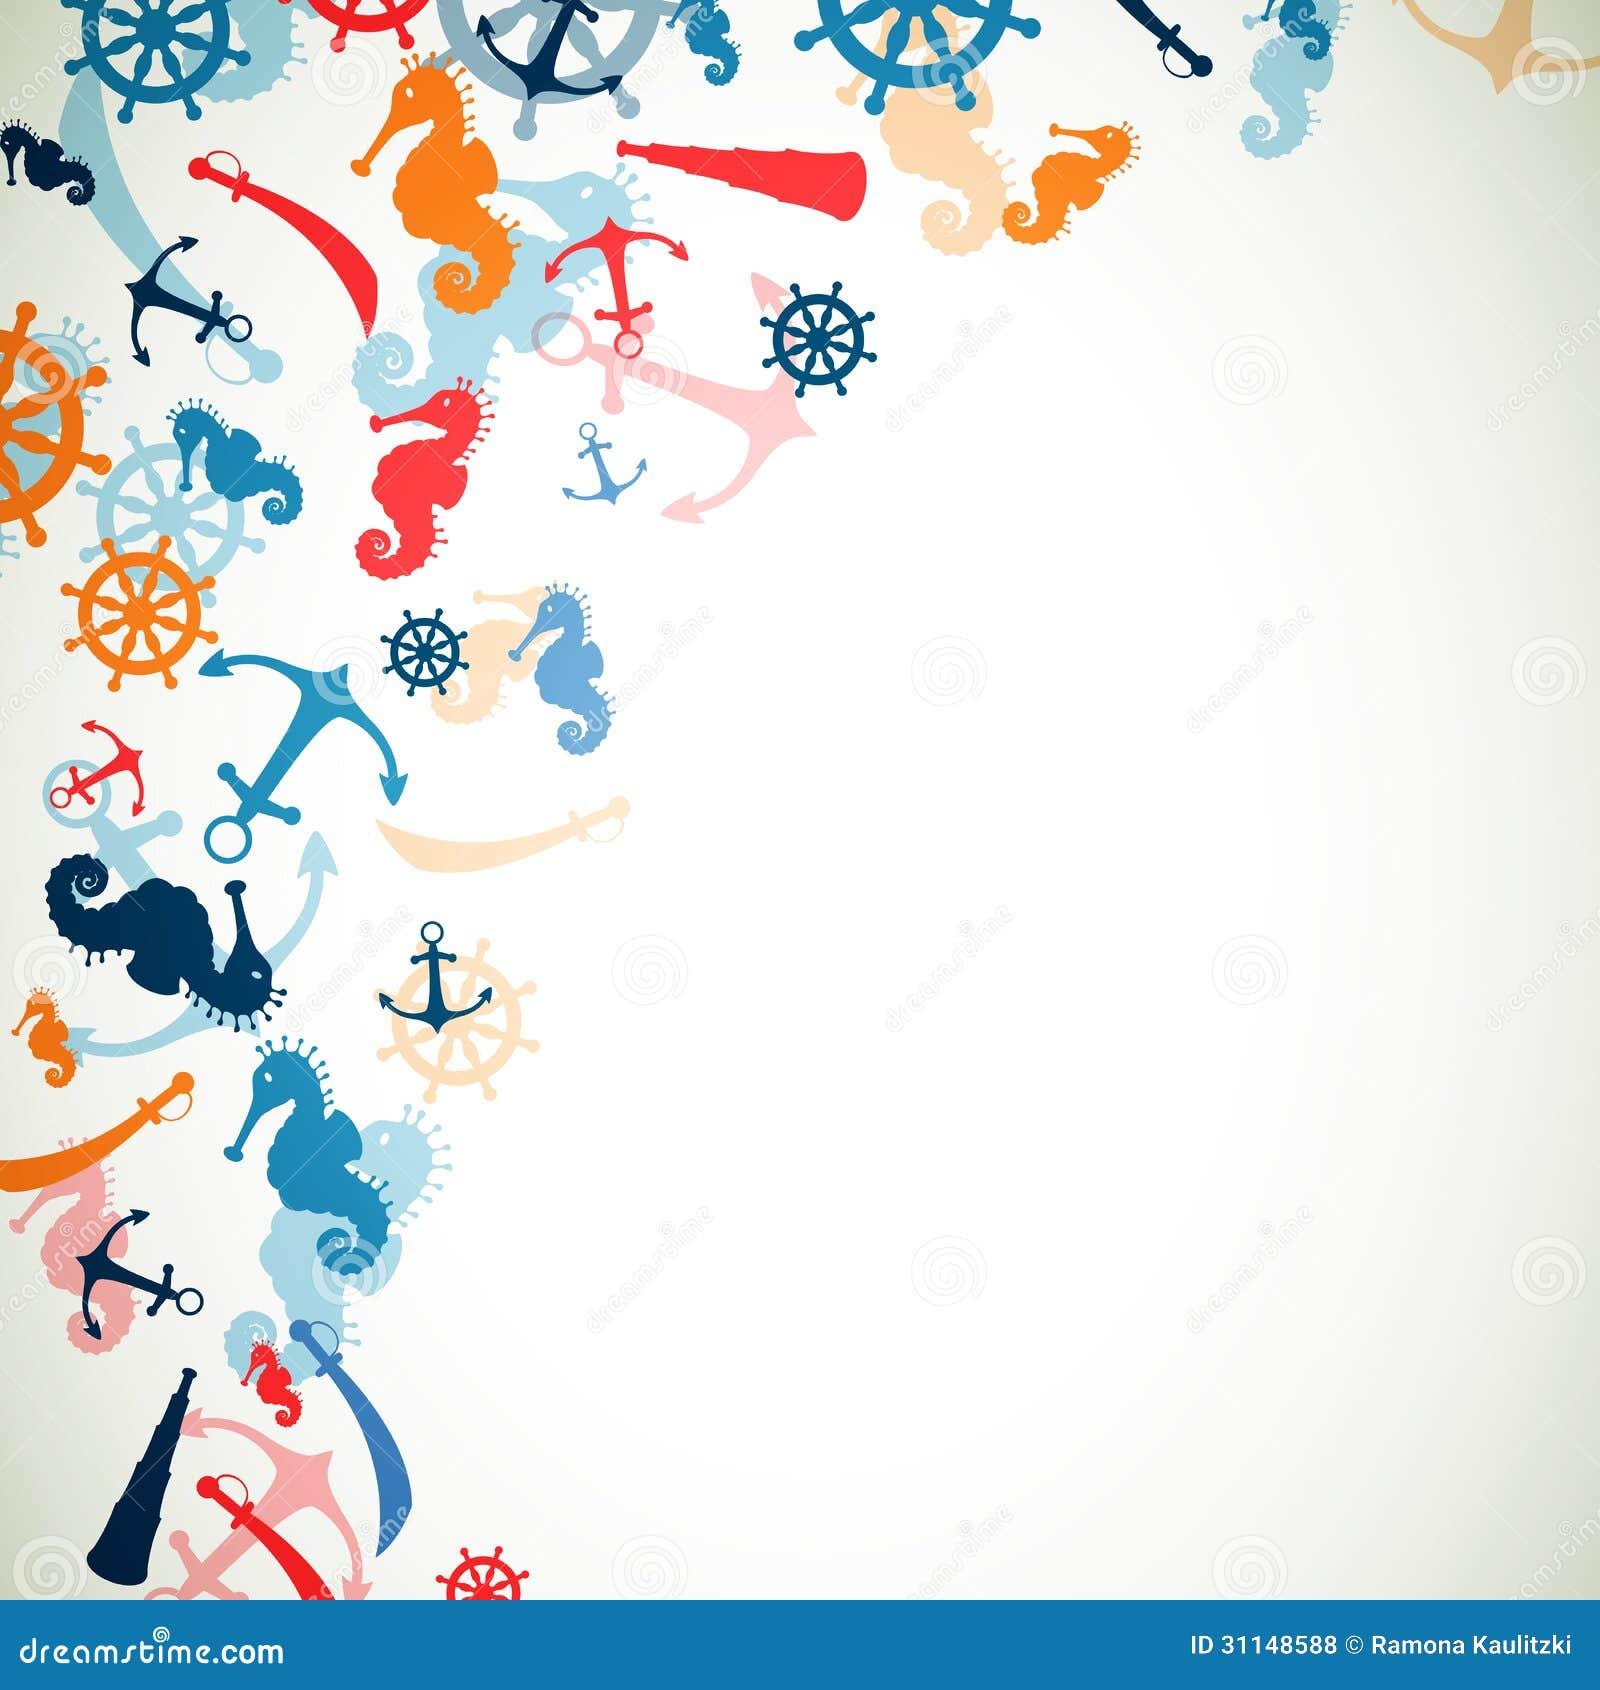 Nautical Desktop Background Wallpapers